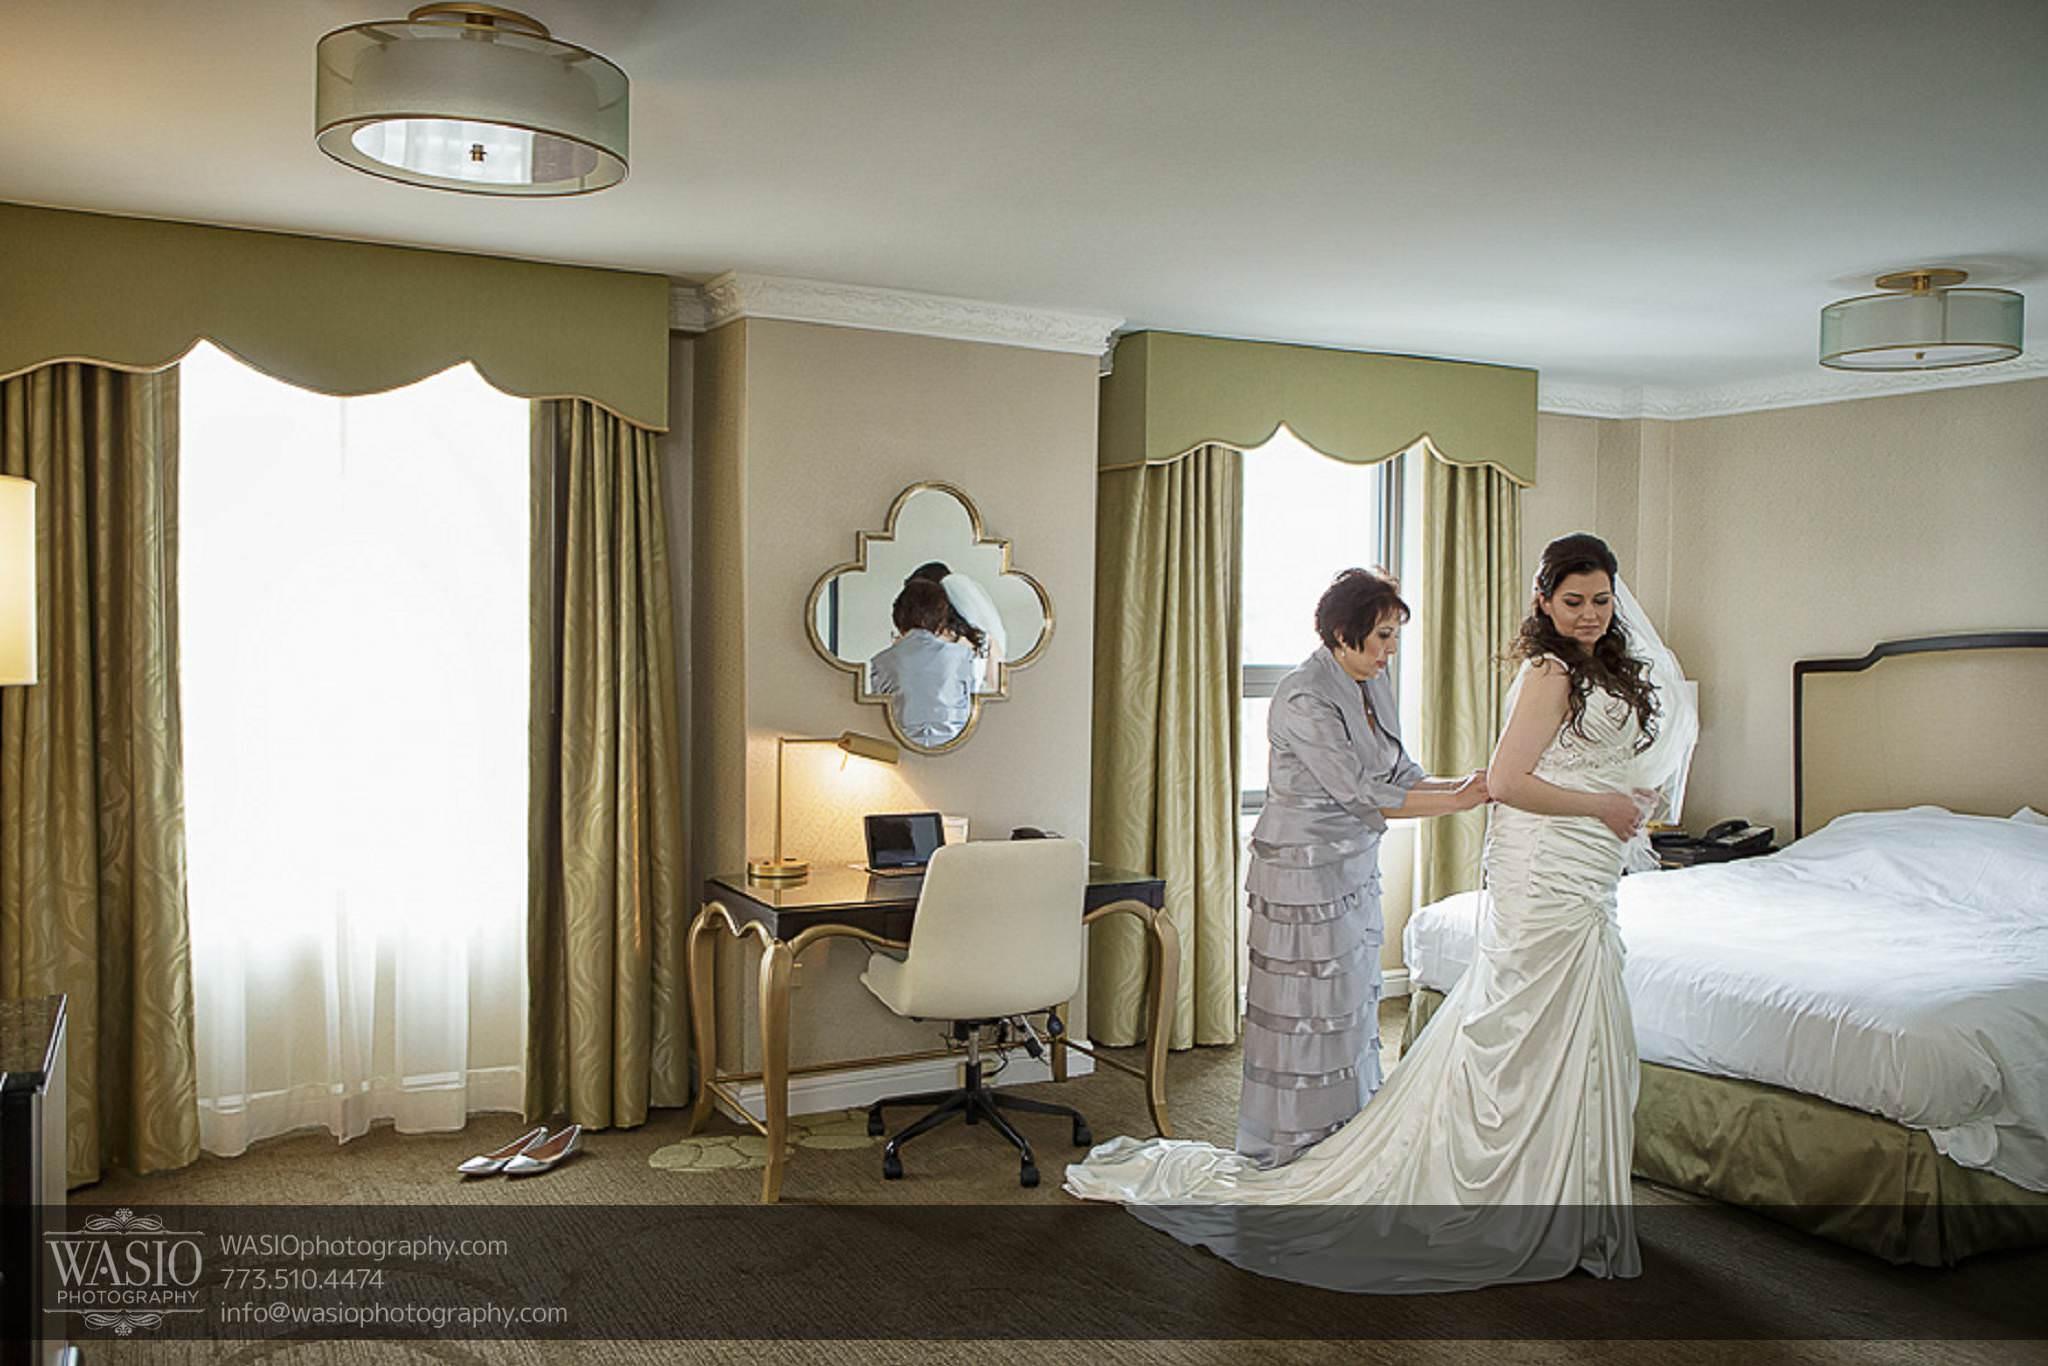 Chicago-wedding-photos-mother-of-bride-putting-on-dress-special-moment-palmer-hotel-045 Chicago Wedding Photos - Svetlana + Yuriy